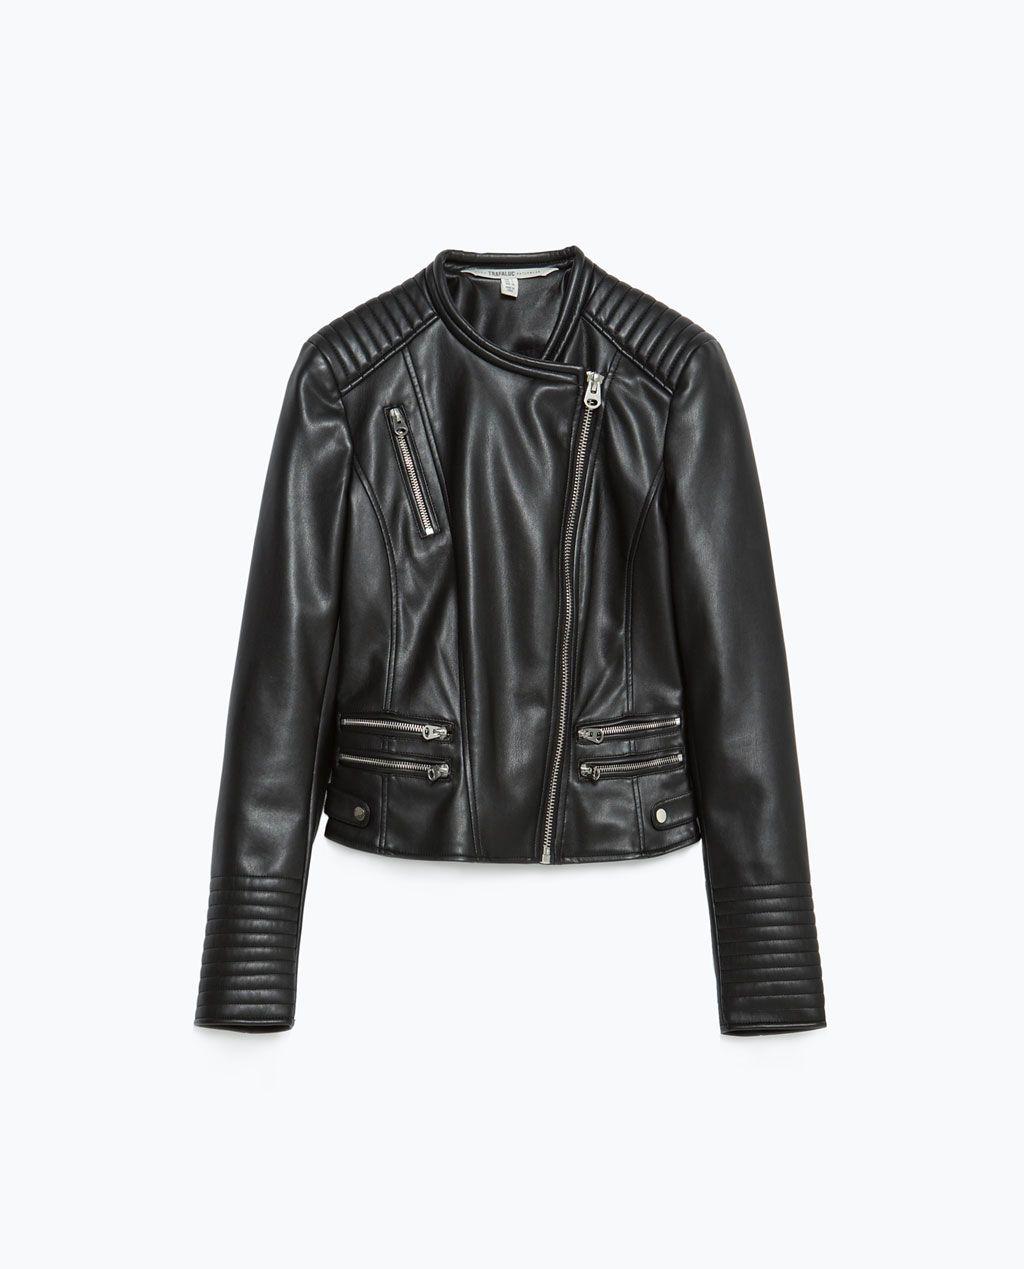 JACKET WITH ZIPS Jackets TRF | ZARA United States | Things